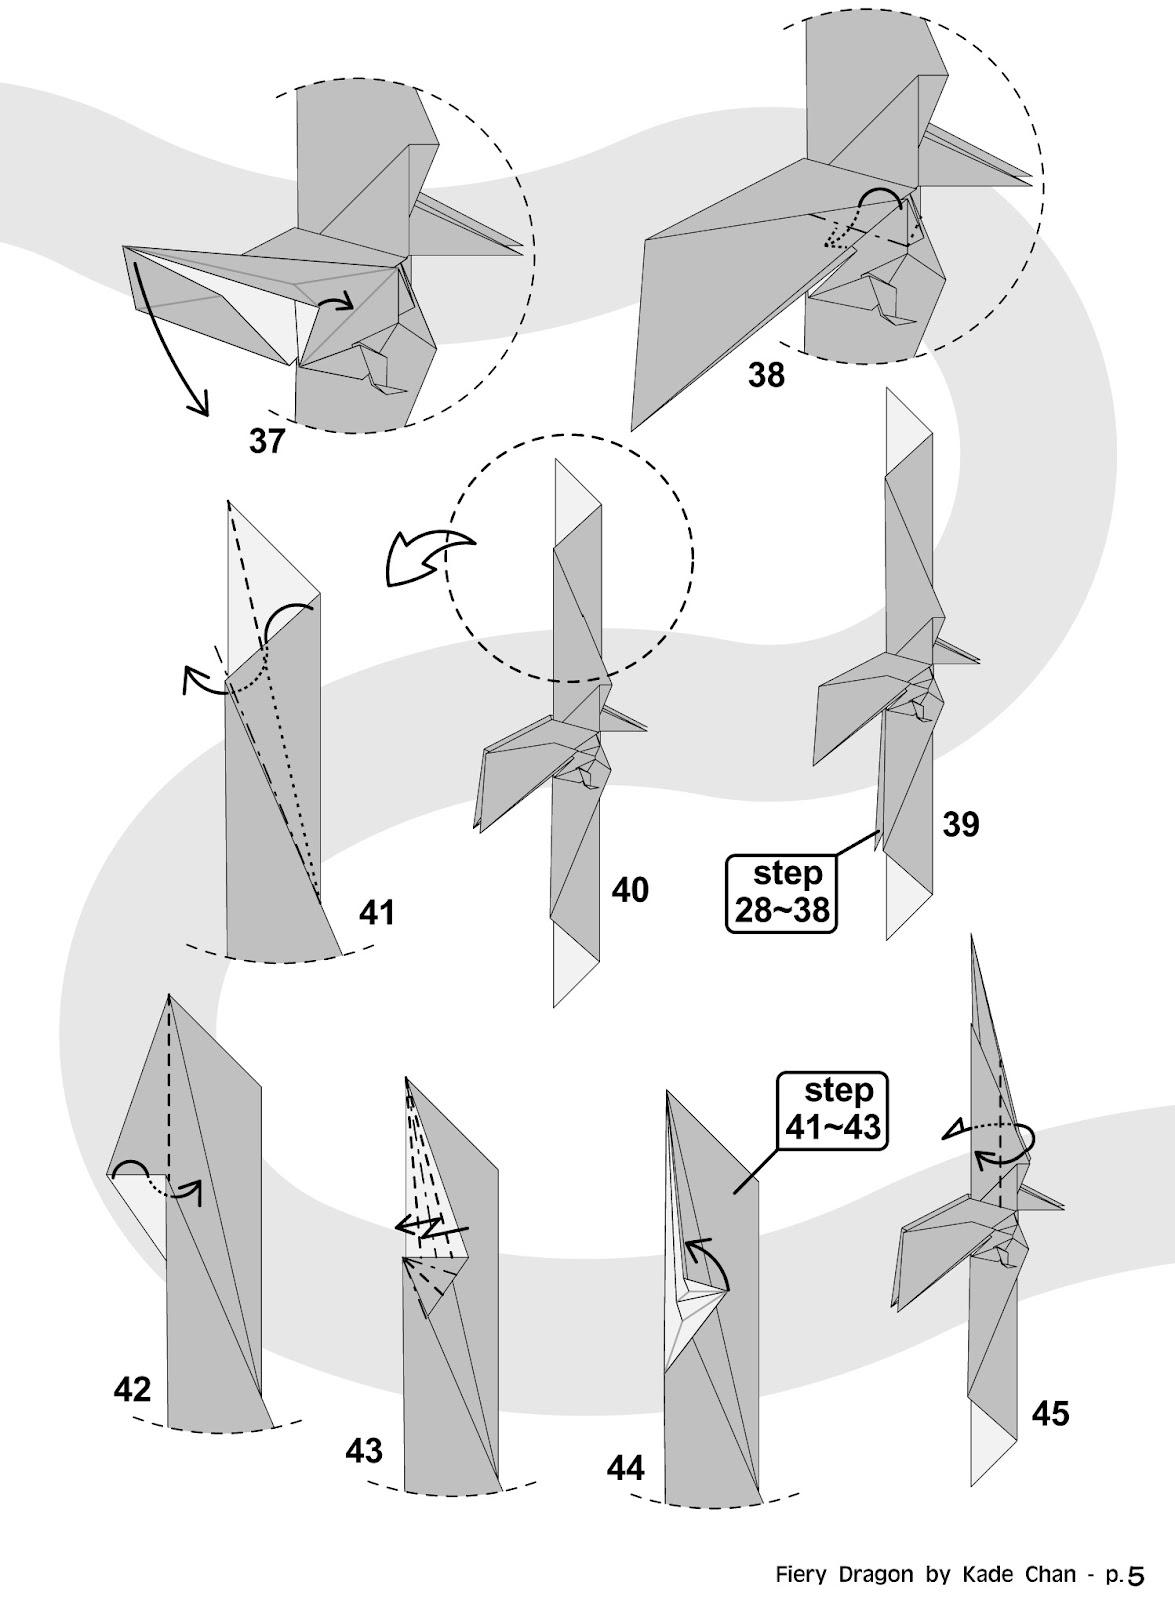 intermediate origami dragon diagram dual 1 ohm wiring kade chan blog 香港摺紙工作室 日誌 fiery